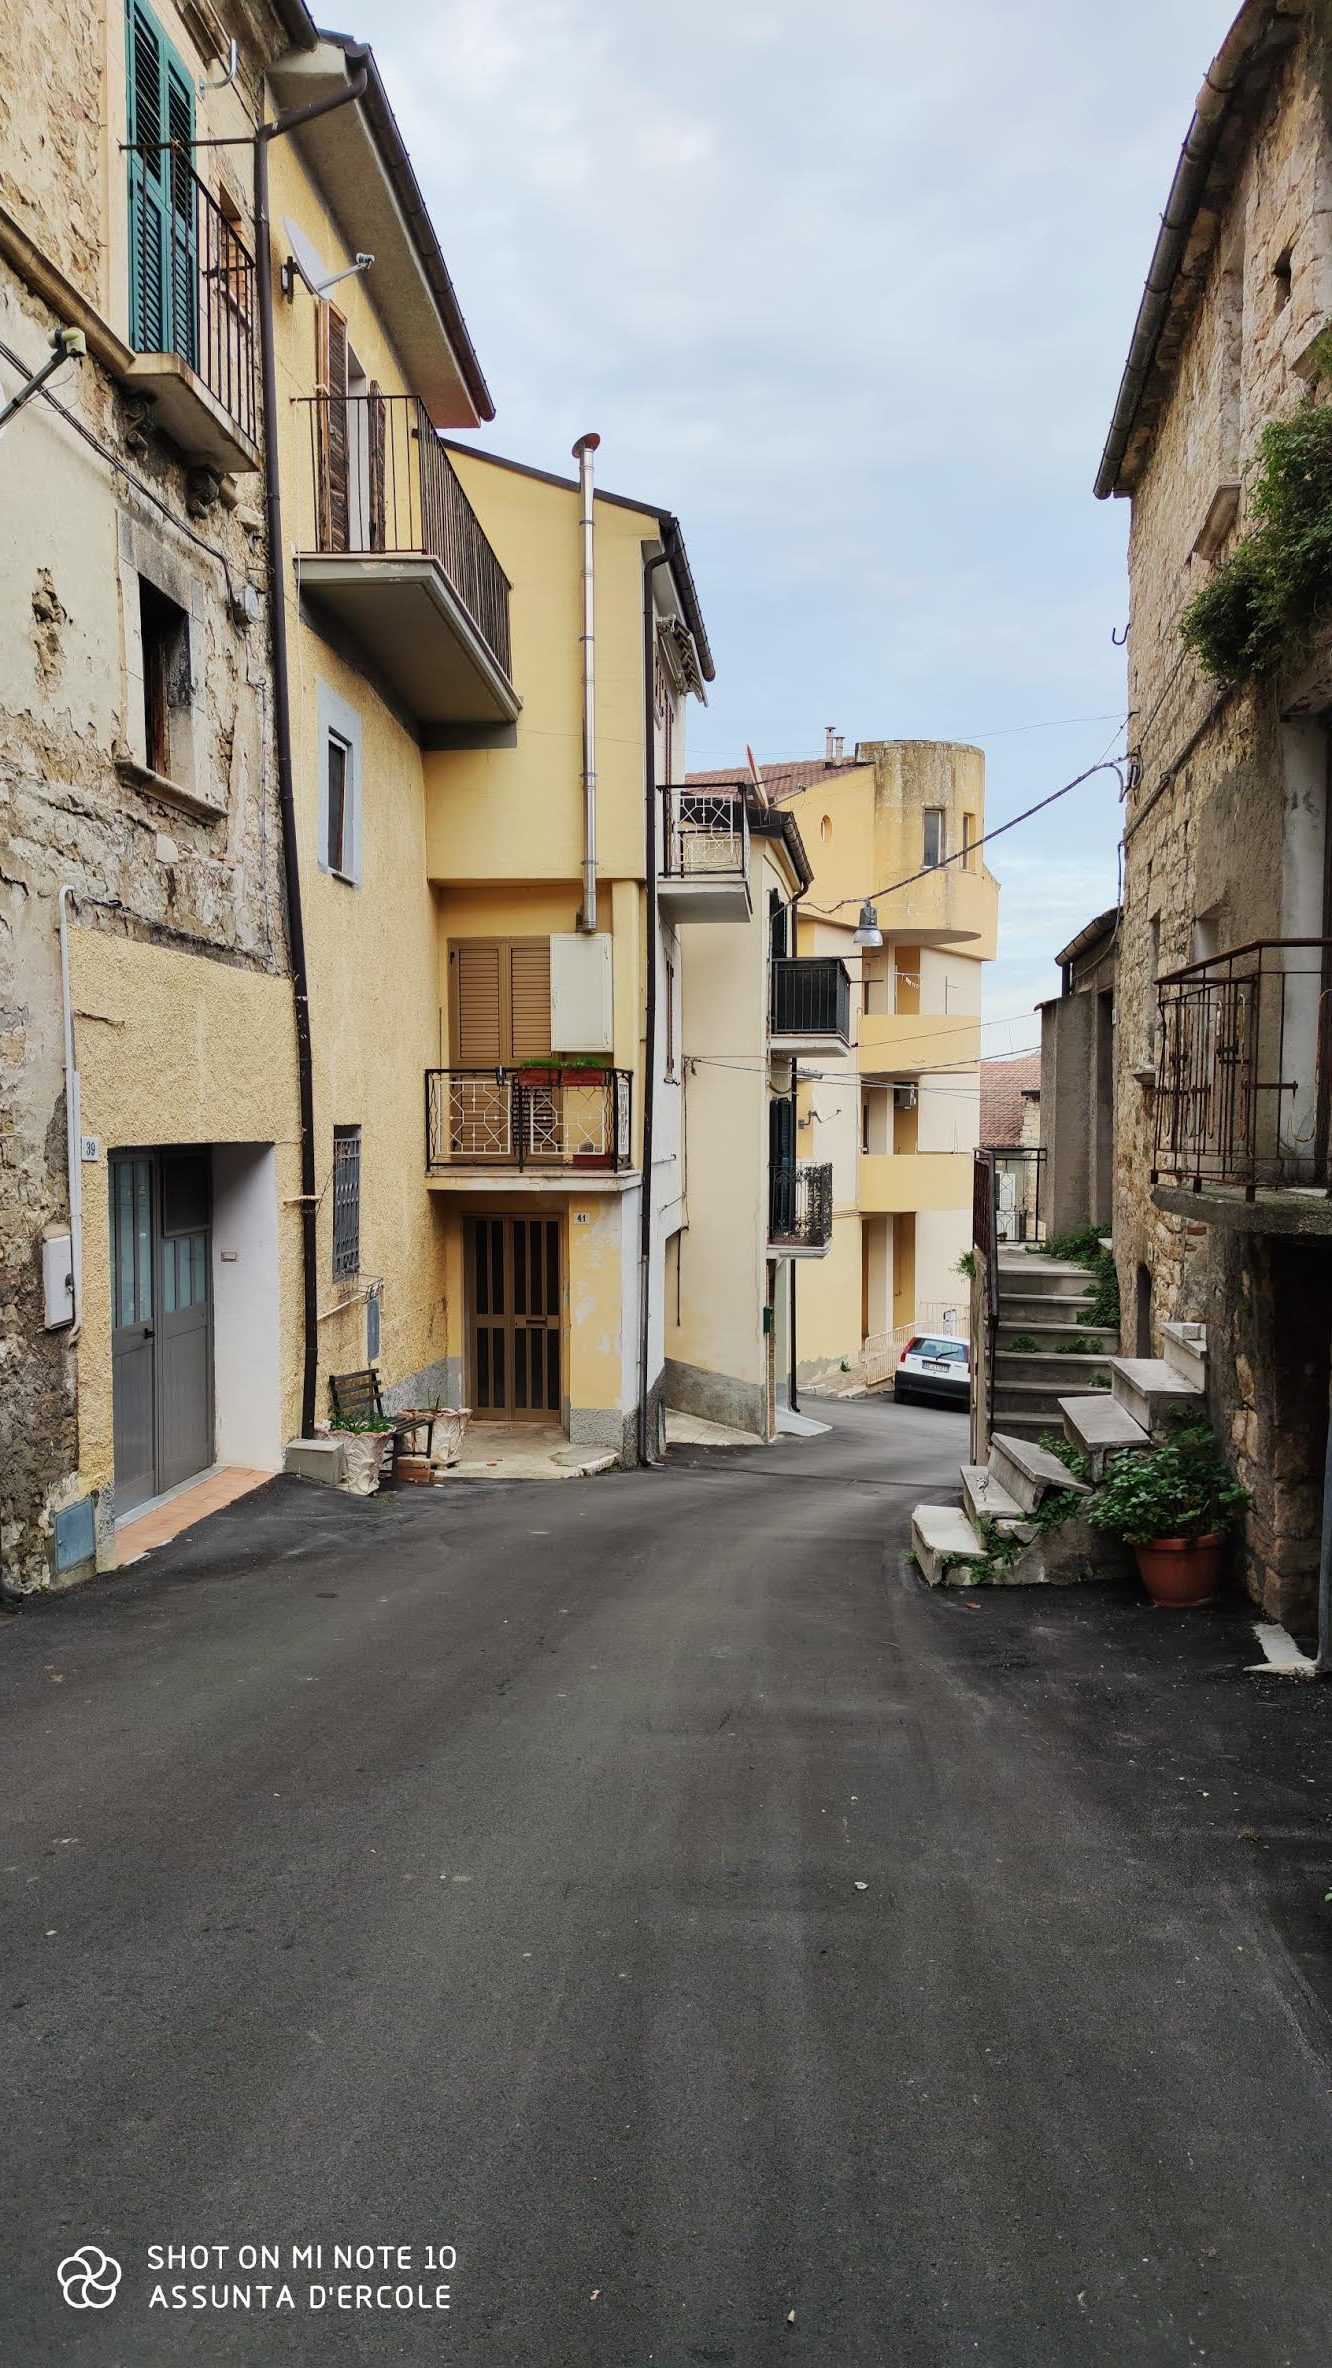 Rif 1198 Casalanguida – Casa in Paese con garage – € 35000